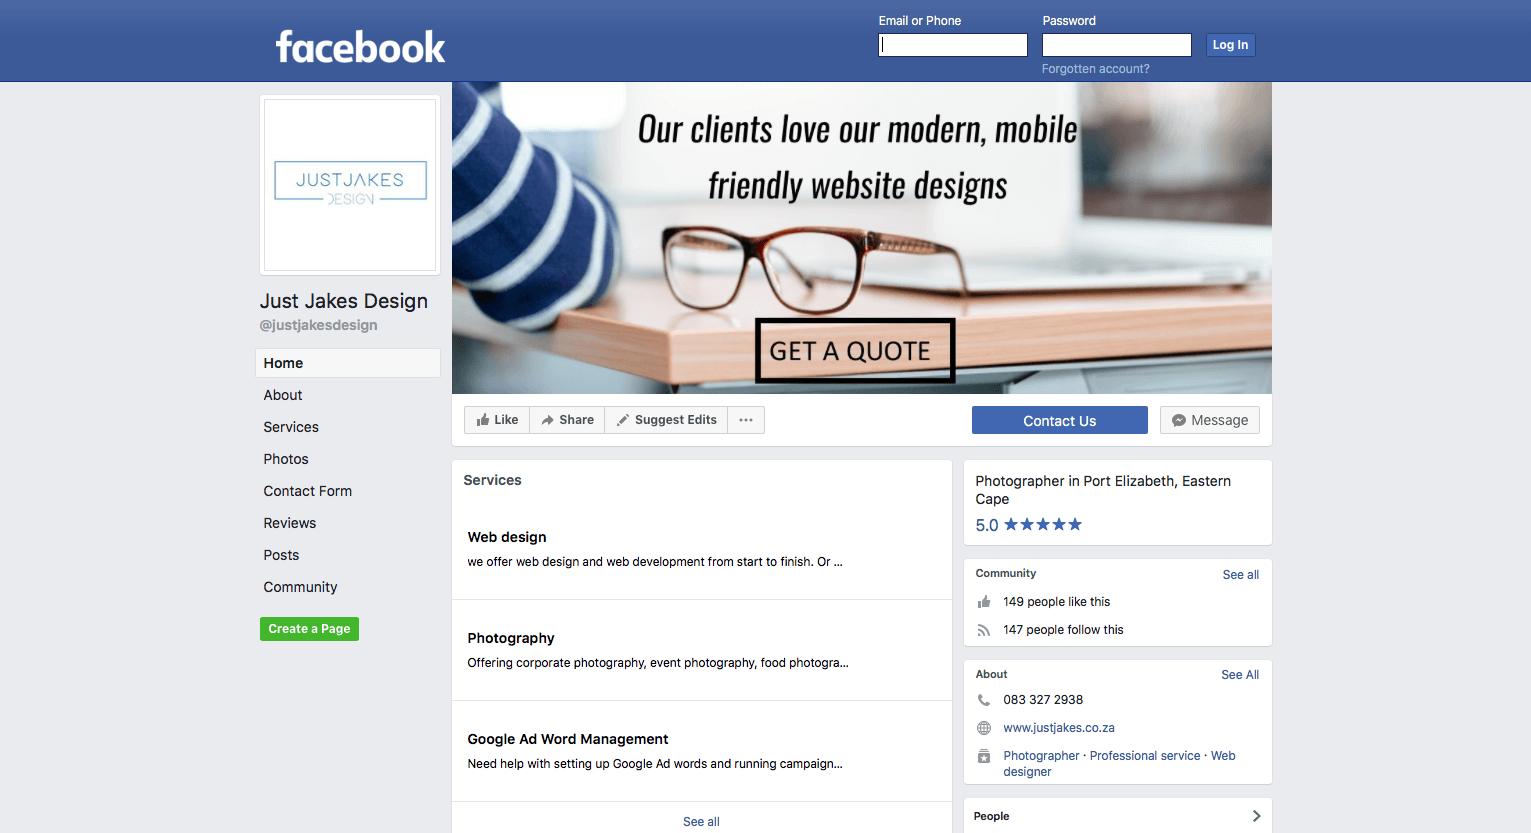 Just Jakes Design Facebook Screenshot